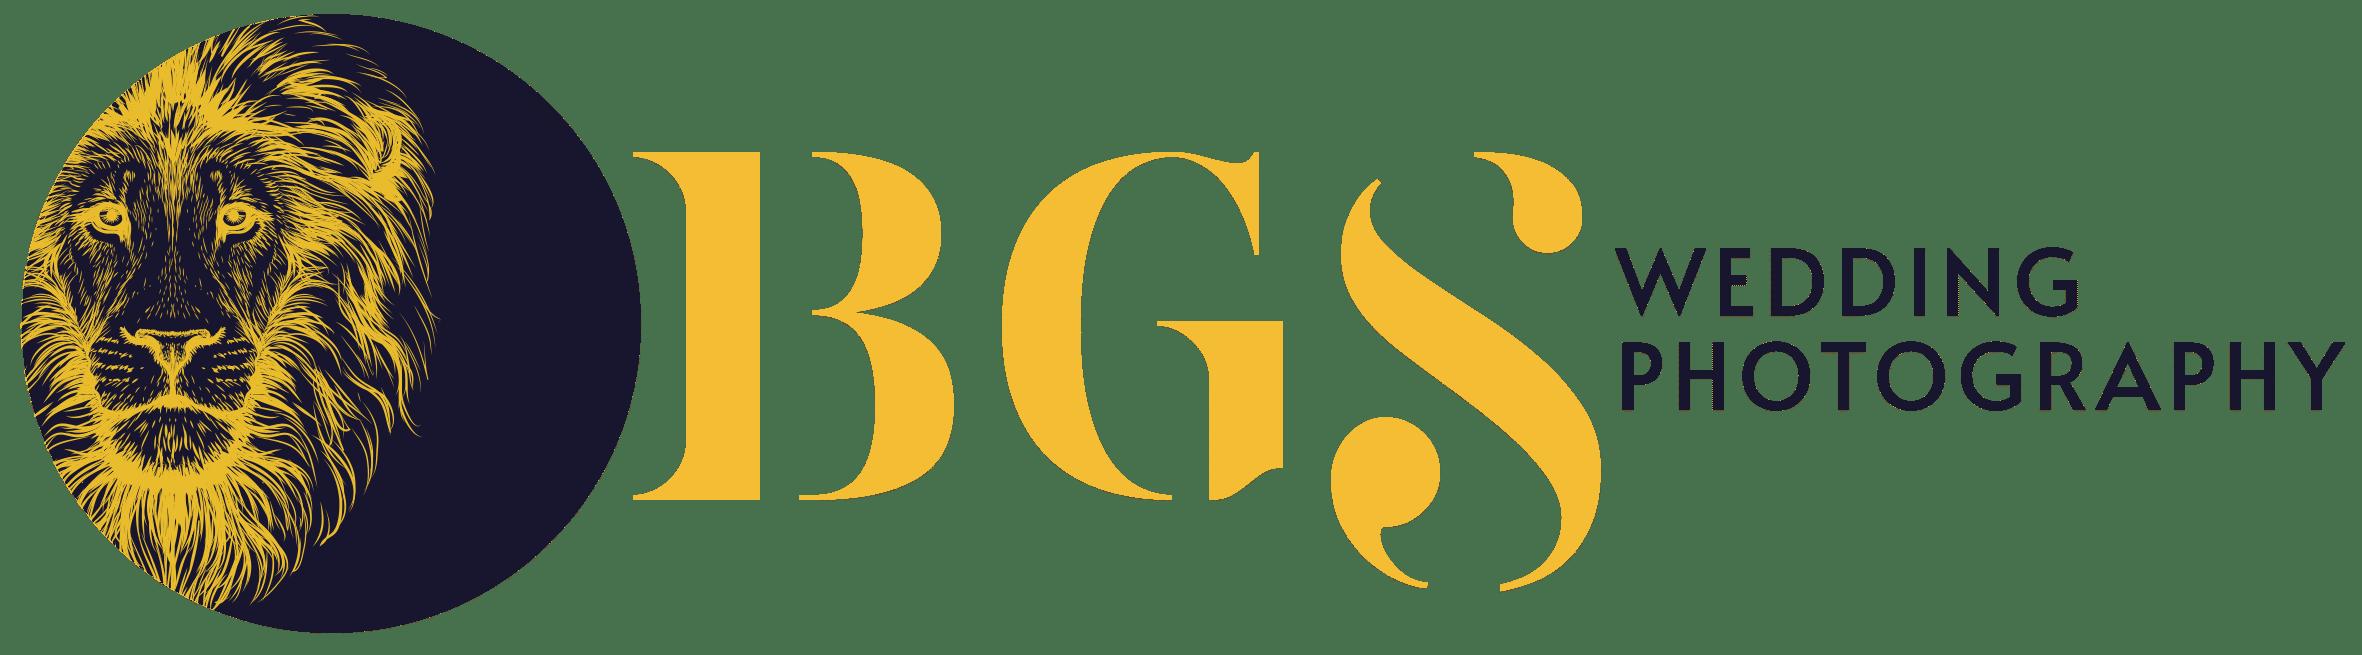 logo which says BGS Weddings